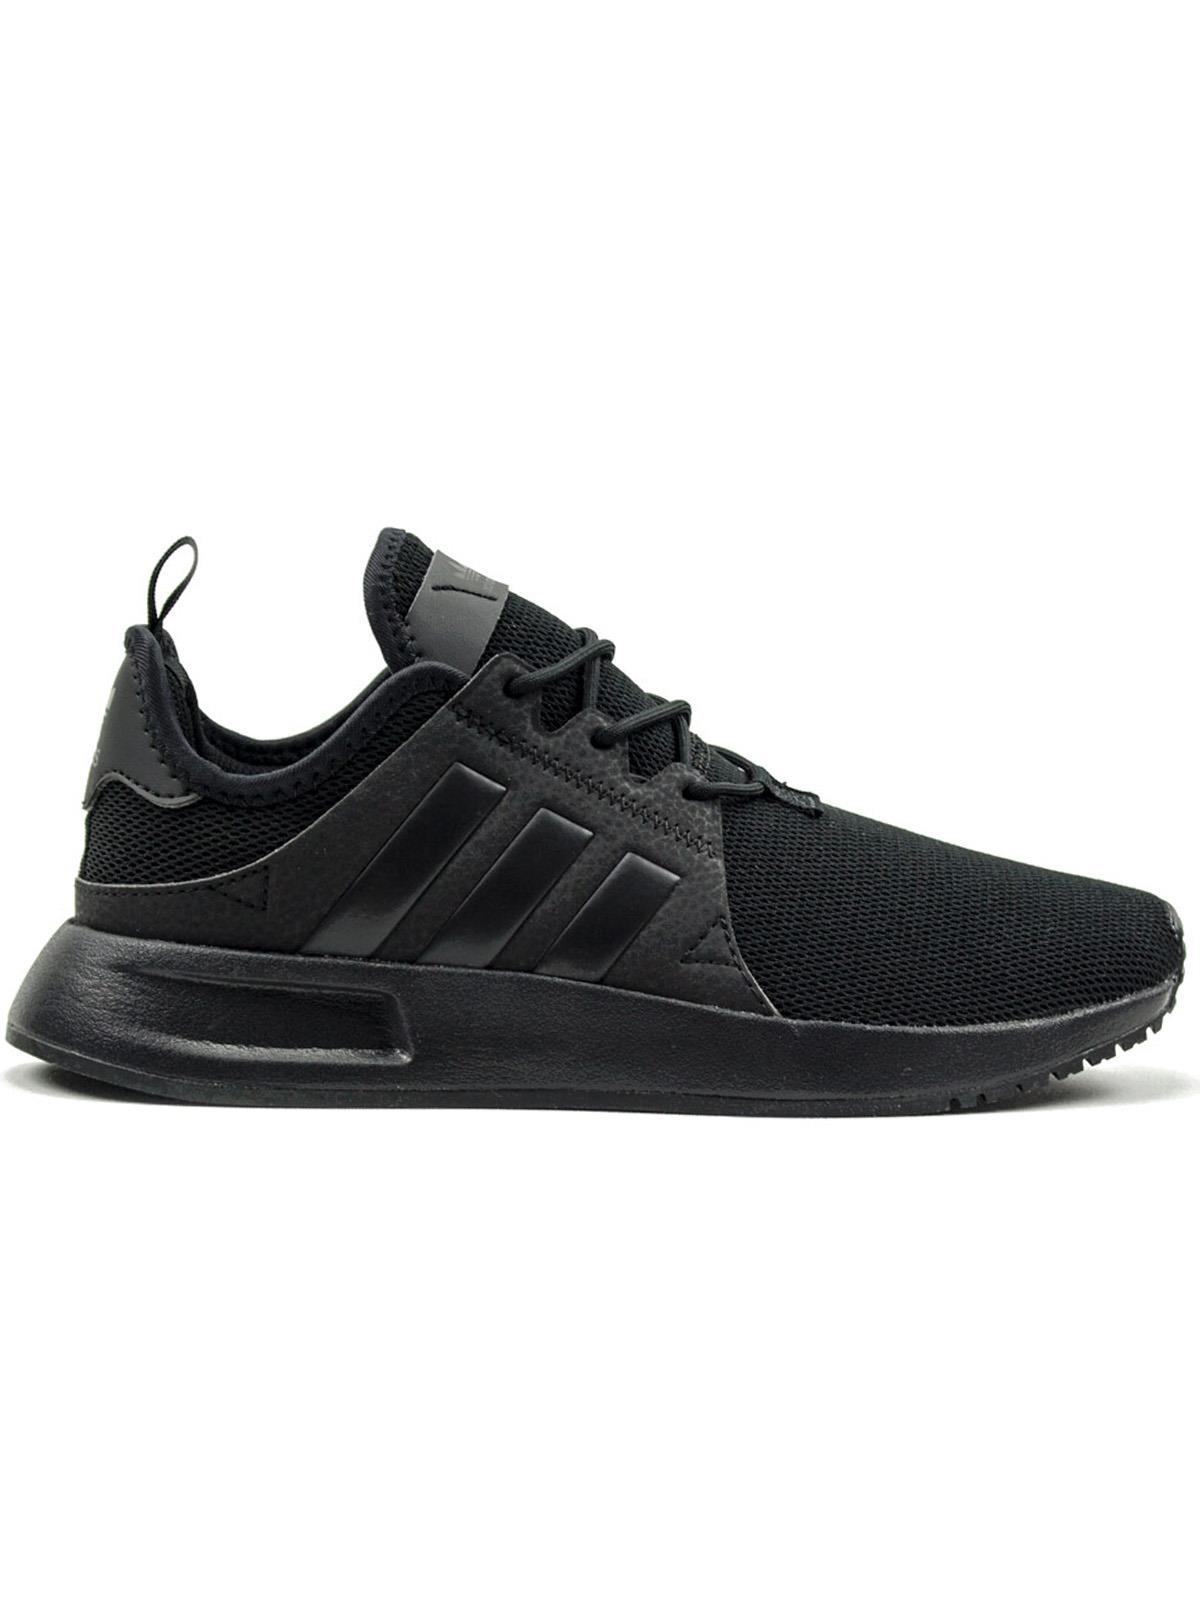 cheap for discount 47587 c4bf6 ADIDAS XPLR J Sneaker Ragazzo BY9879